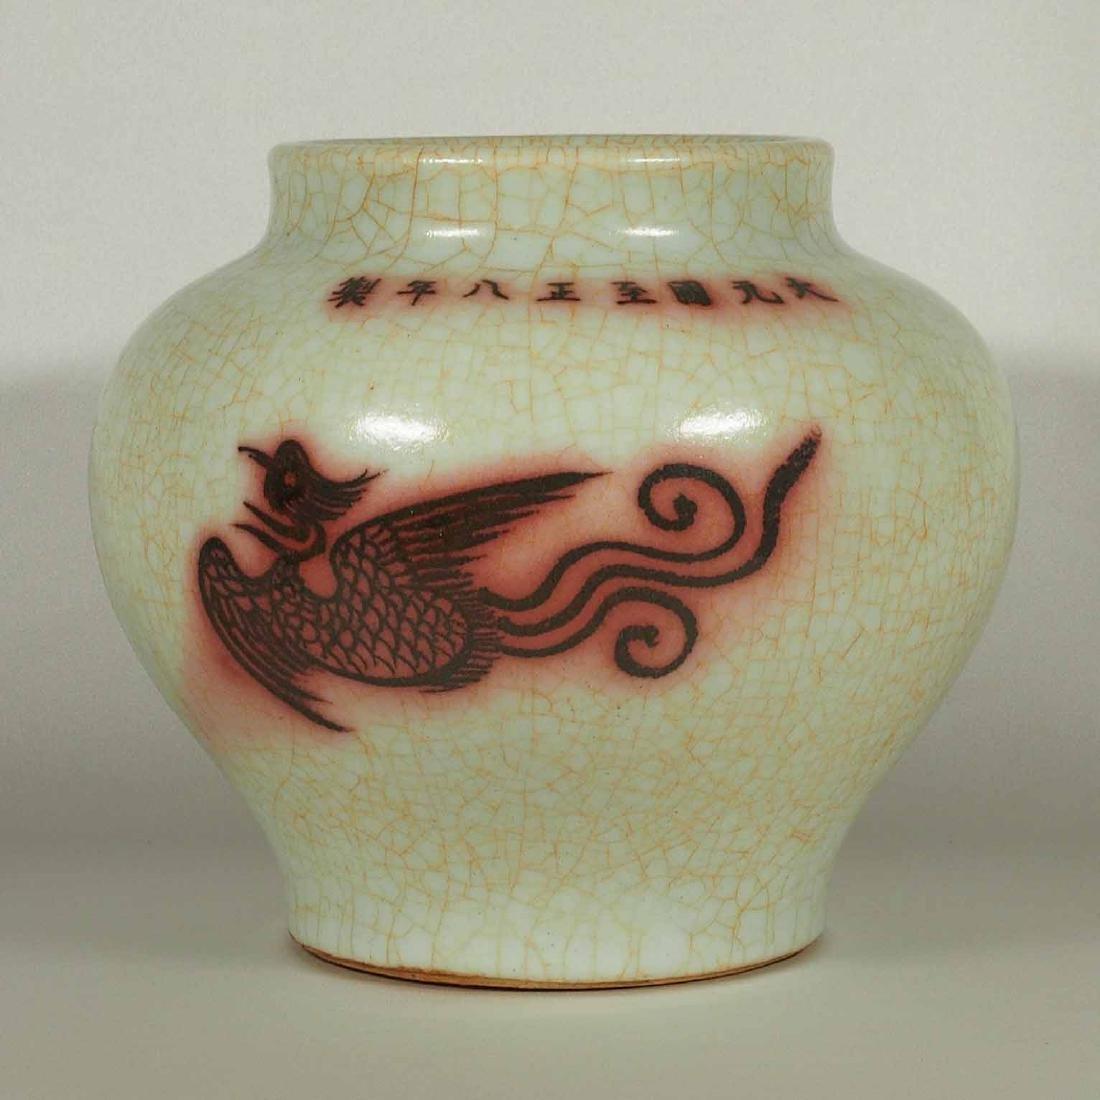 Cracked Jar with Phoenix Design, Zhizheng Mark, Yuan